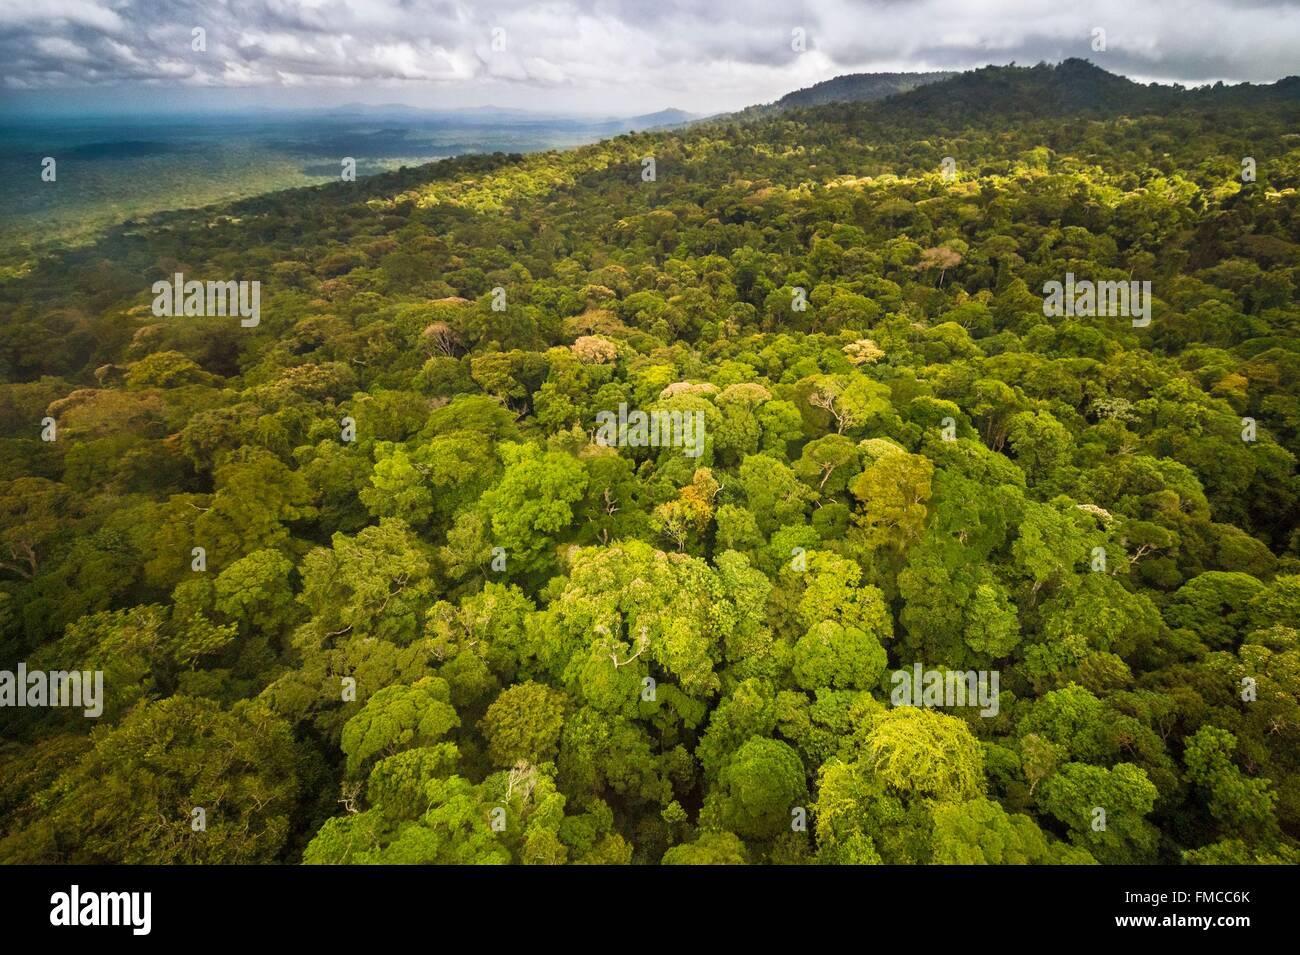 France, Guyana, French Guyana Amazonian Park, heart area, Camopi, Mount Itoupe (830 m), the second summit of French - Stock Image